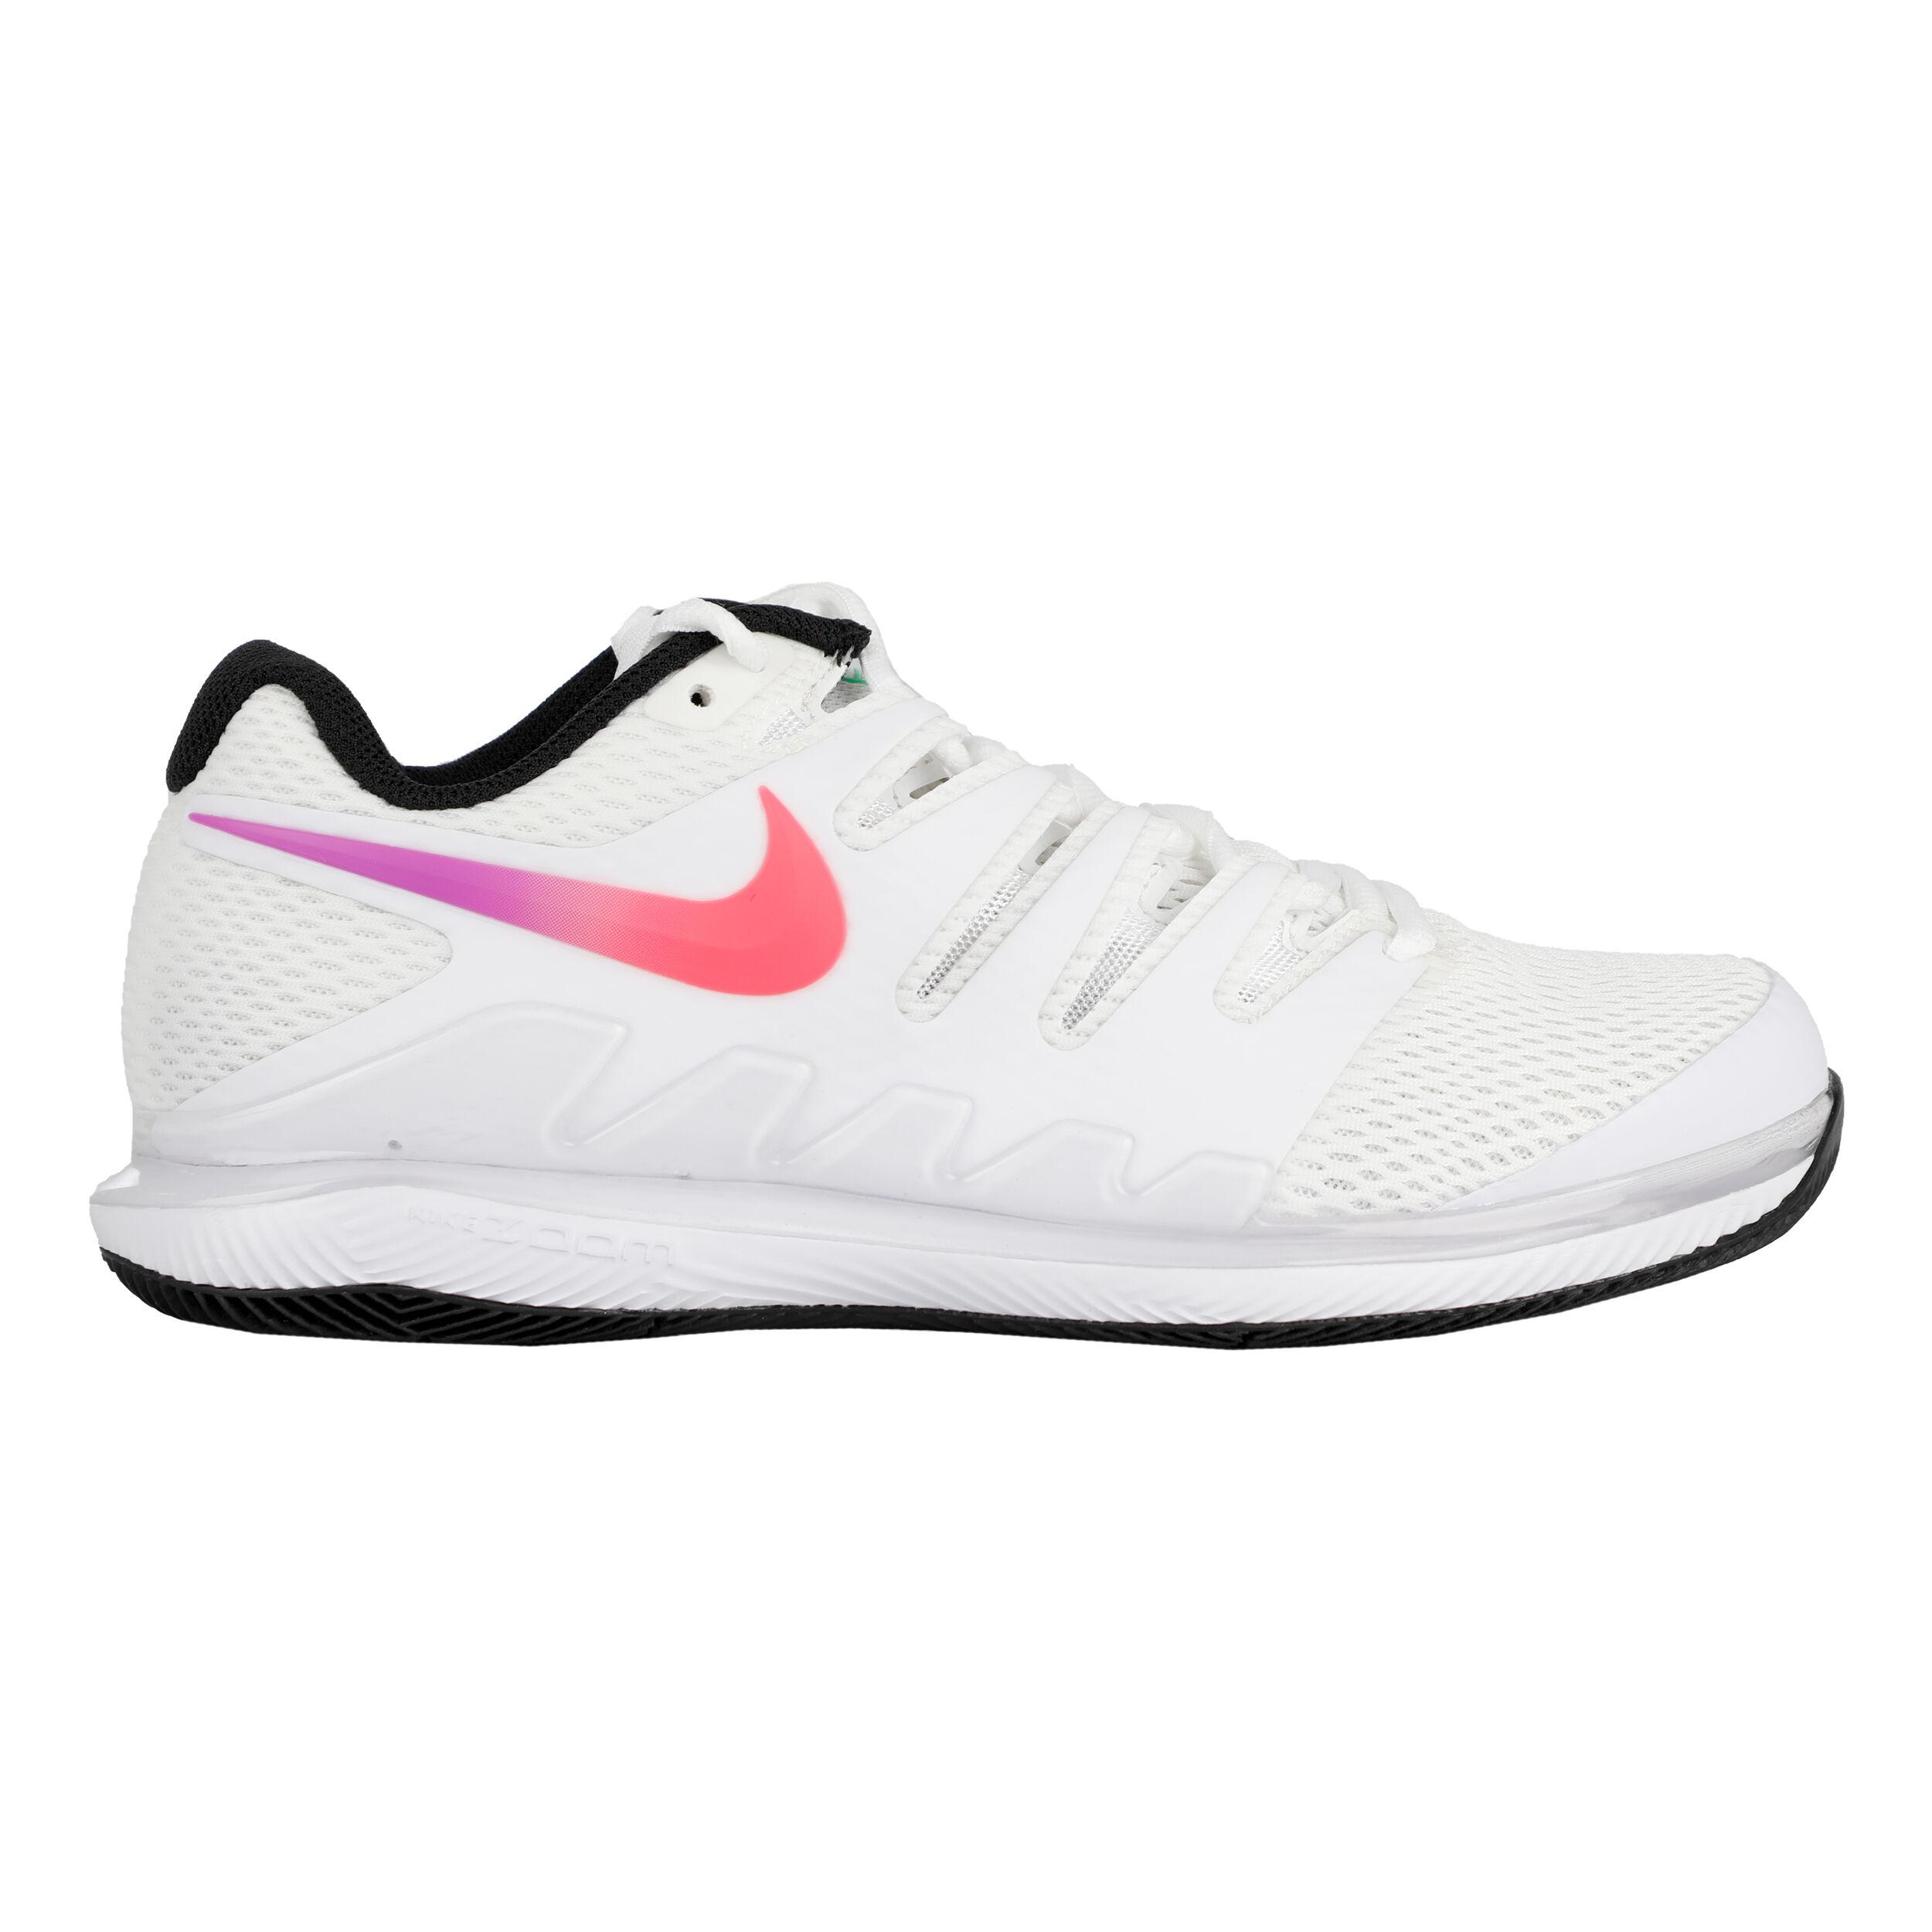 buy Nike Air Zoom Vapor X HC All Court Shoe Men - White, Black ...